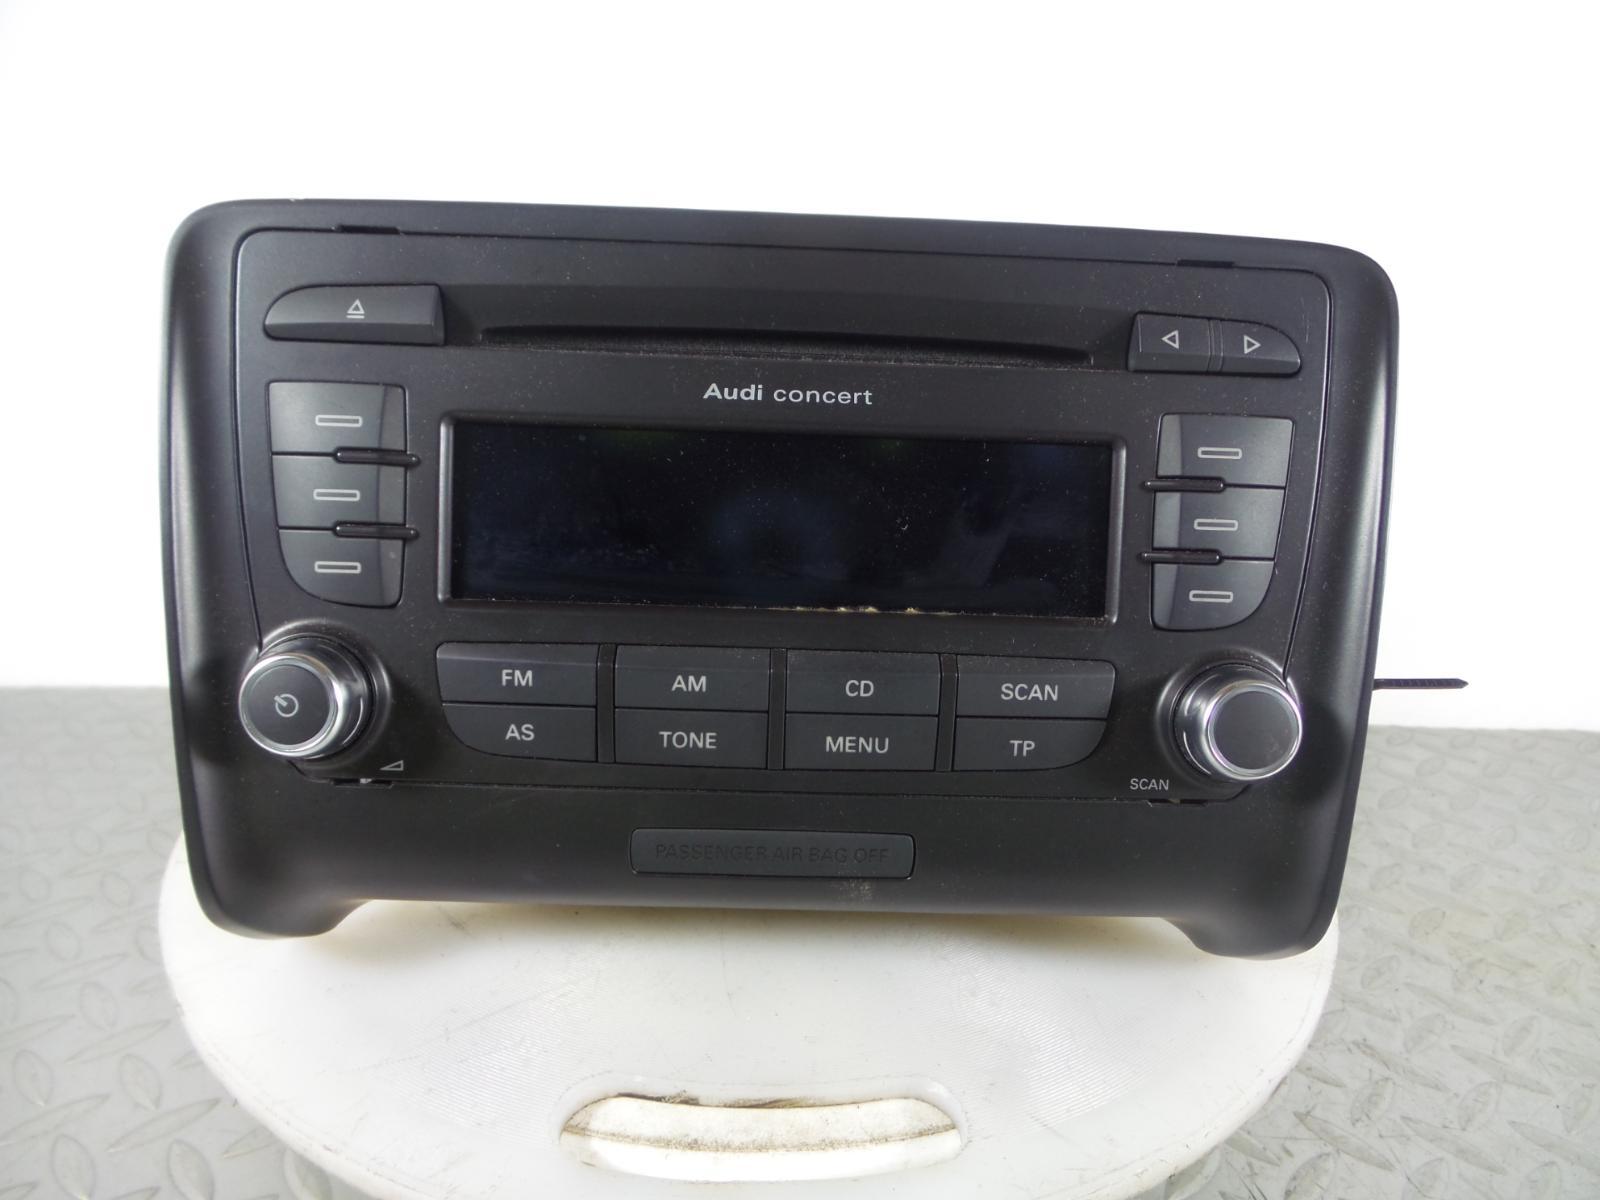 2007 Audi Tt 8j 2006 2014 Concert Ii Cd Player Radio Code